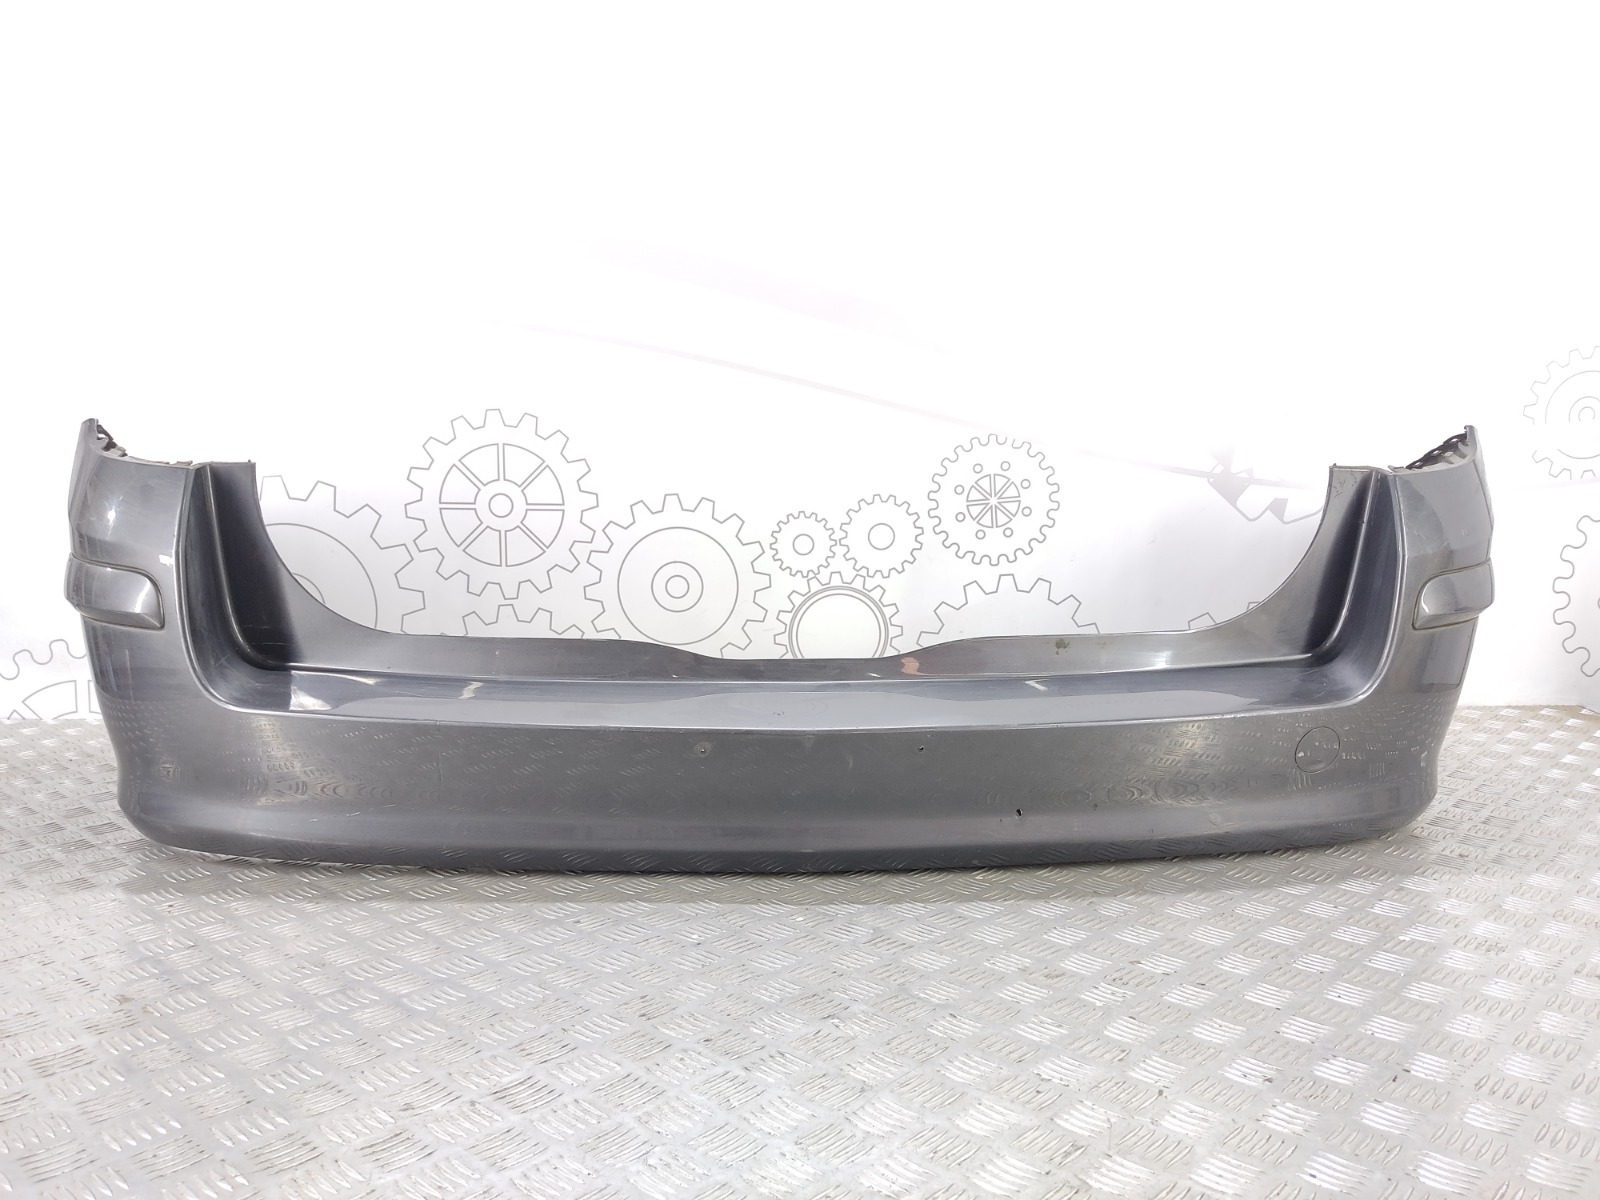 Бампер задний Opel Astra H 1.7 CDTI 2007 (б/у)